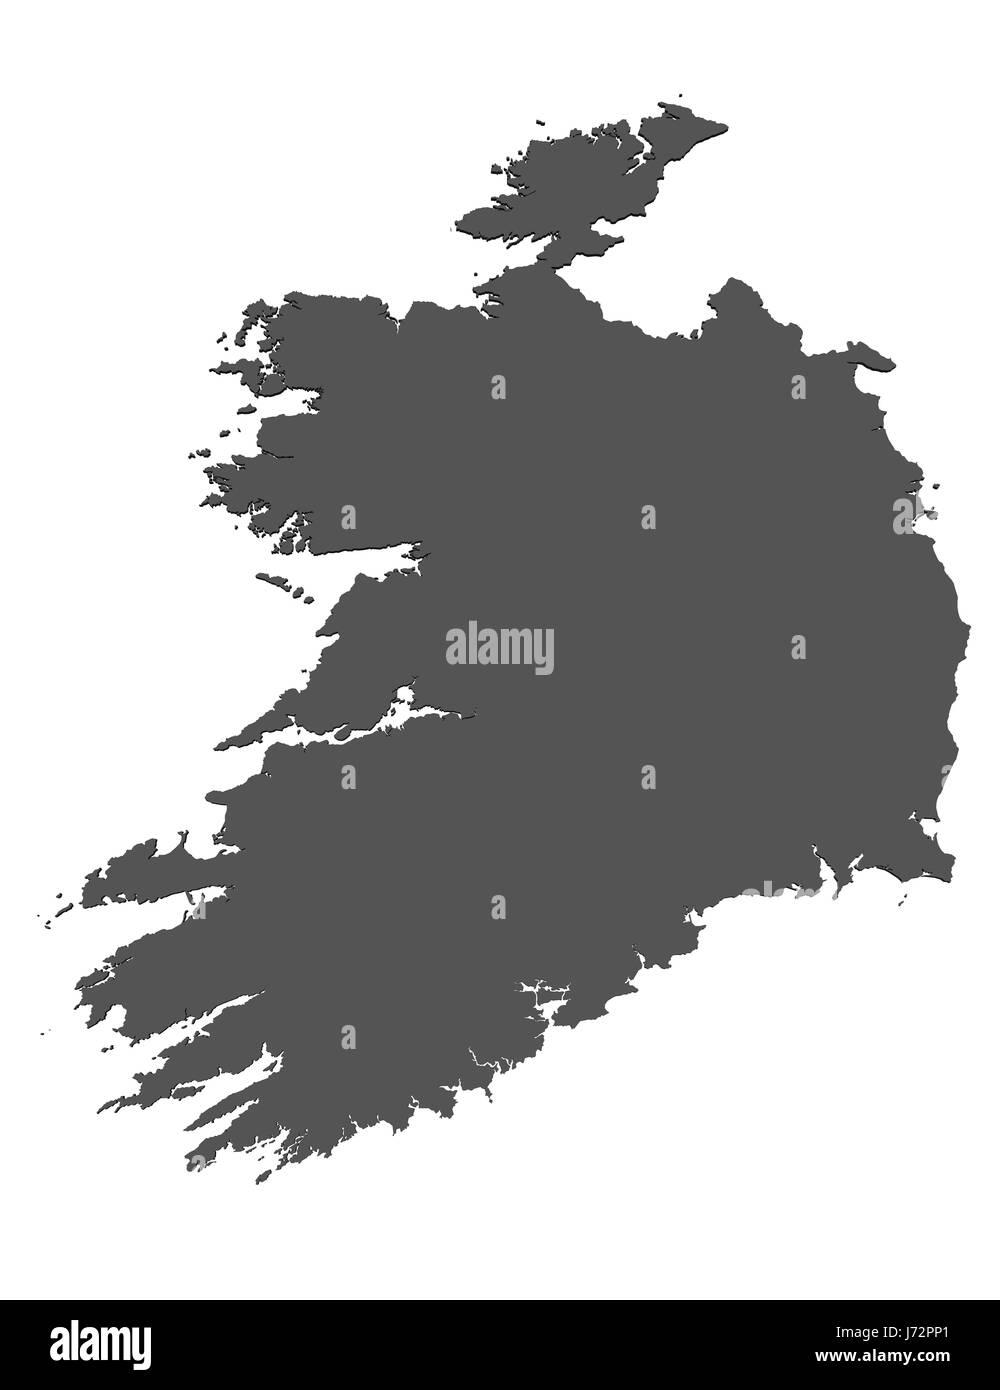 Europe Card Ireland European Union Joining Atlas Map Of The World